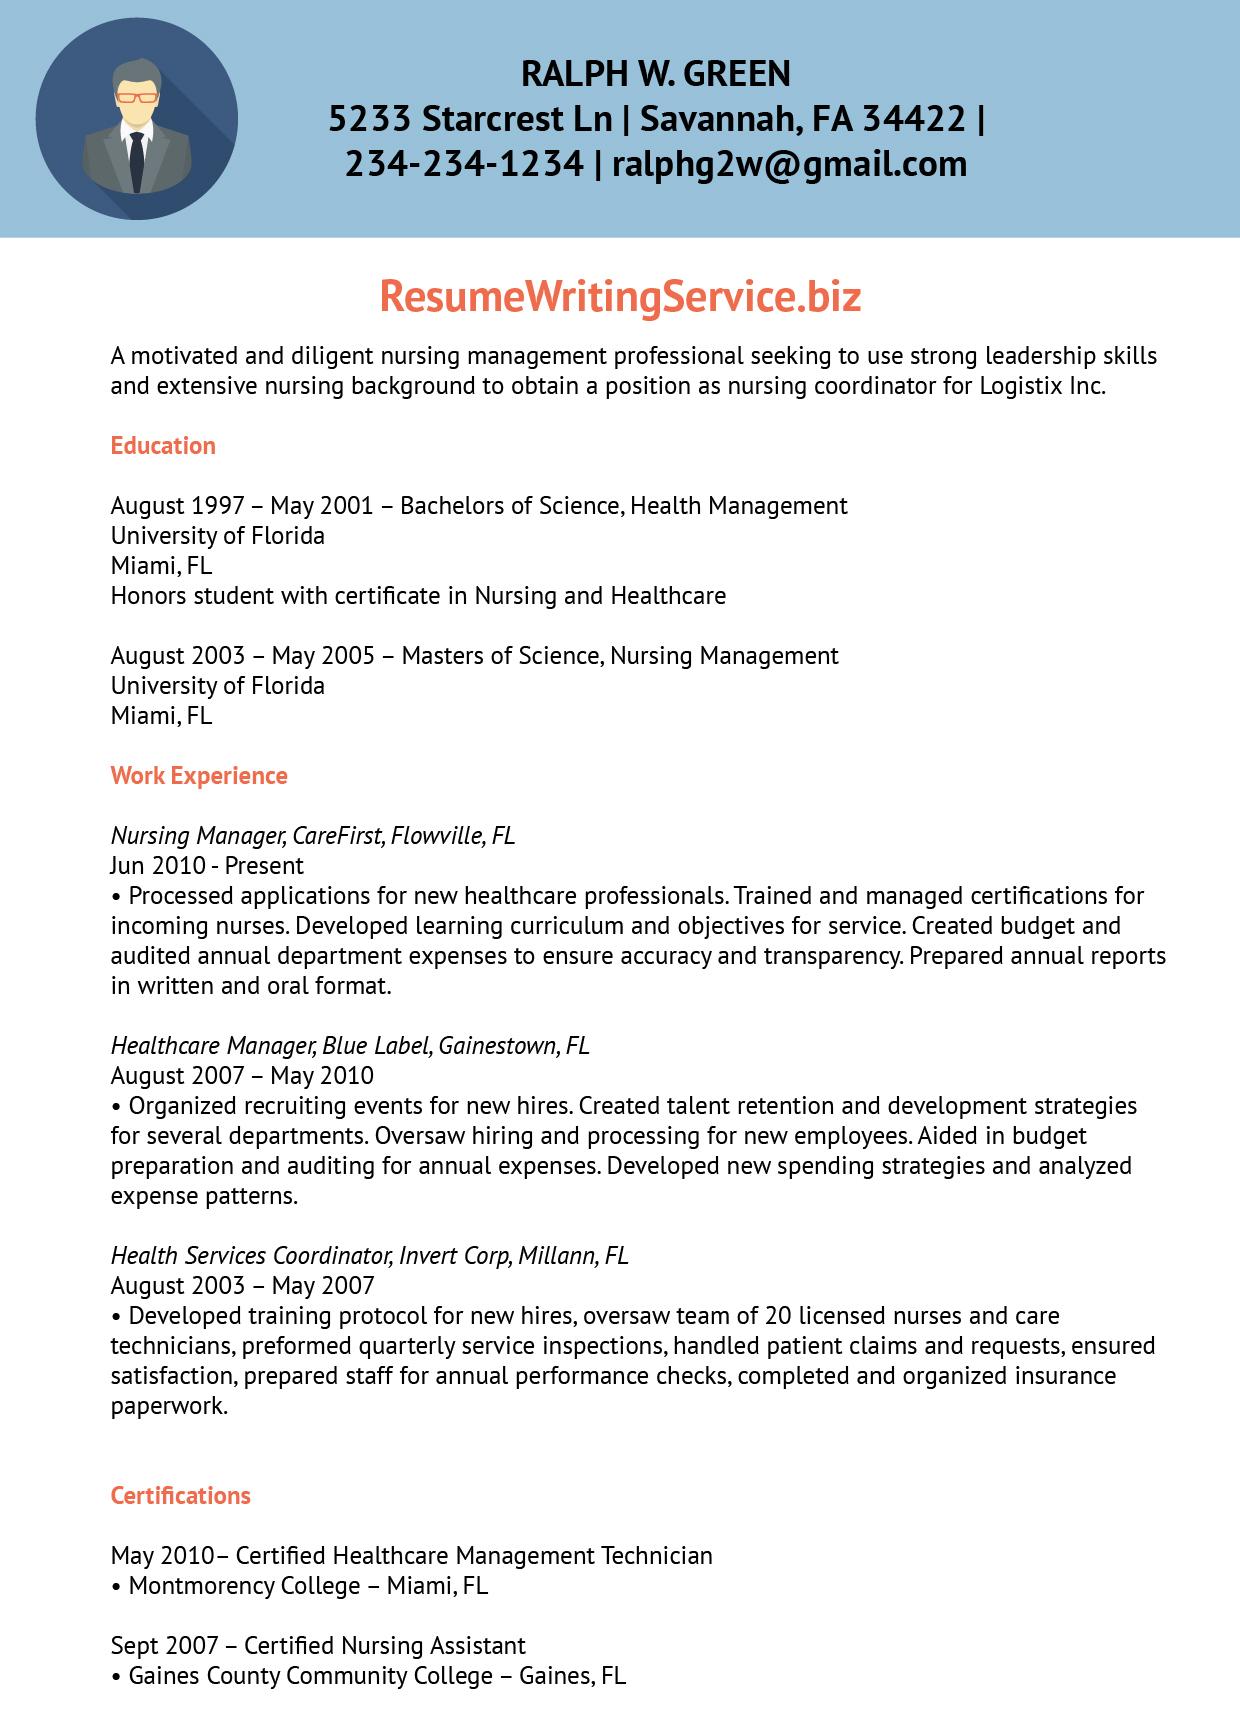 facility coordinator cover letter - Elim.carpentersdaughter.co